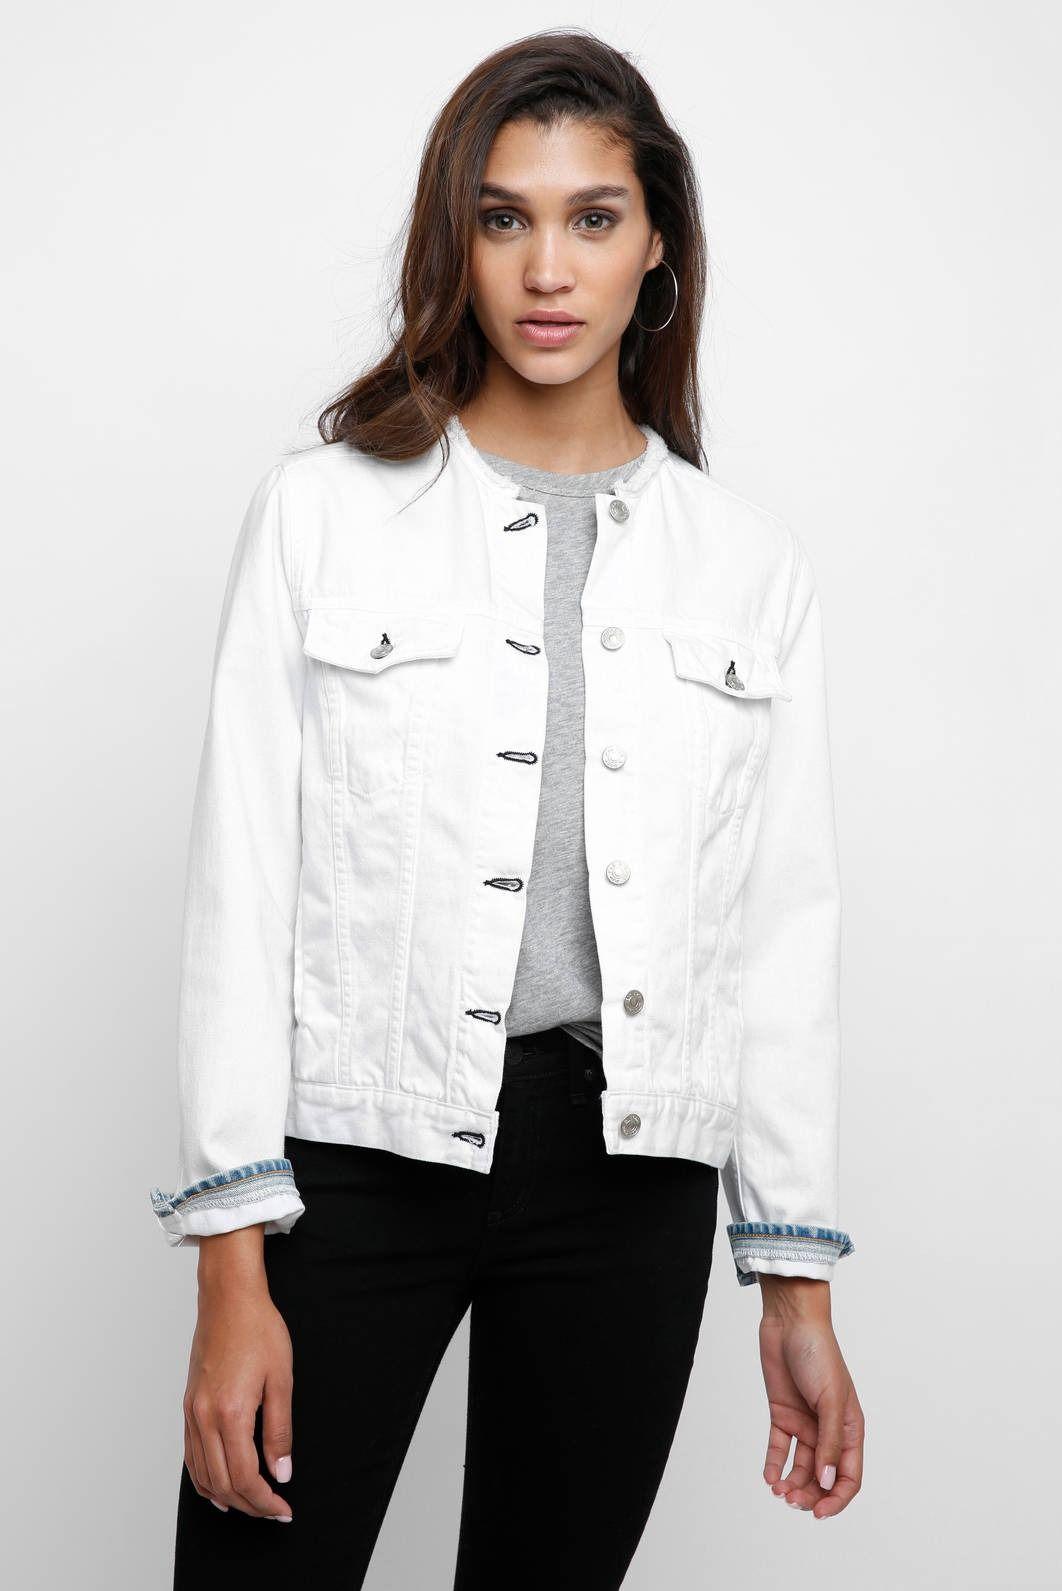 Rag Bone Collarless White Denim Jacket South Moon Under White Denim Jacket Outfit White Denim Jacket White Denim